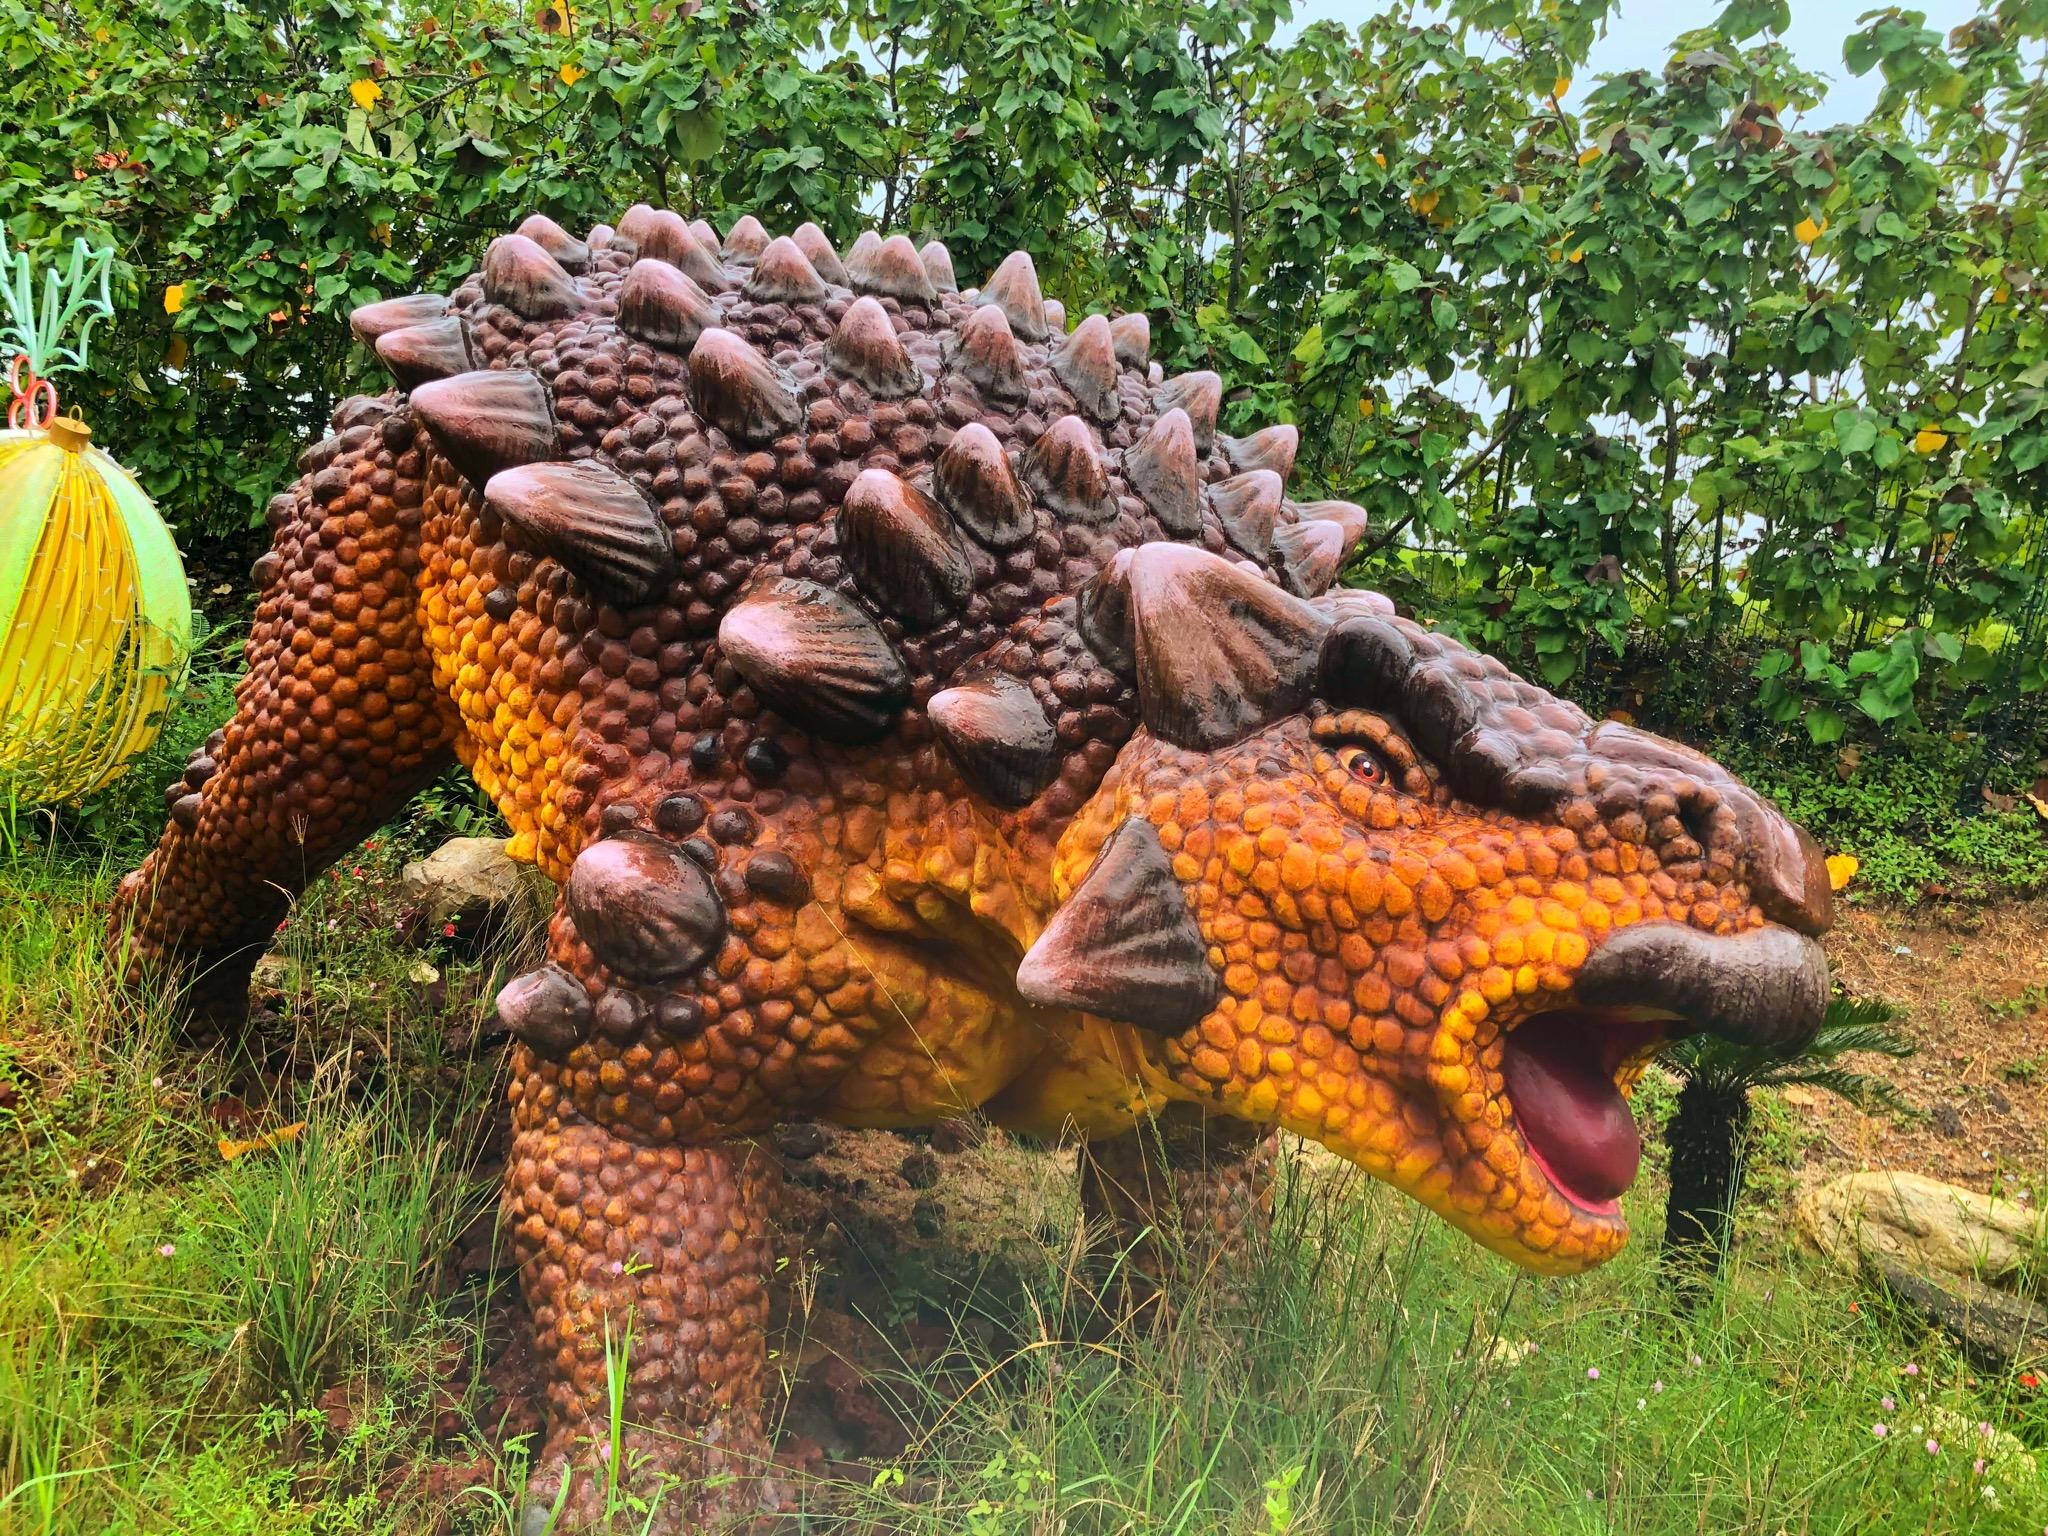 ankylosaurus at changi jurassic mile